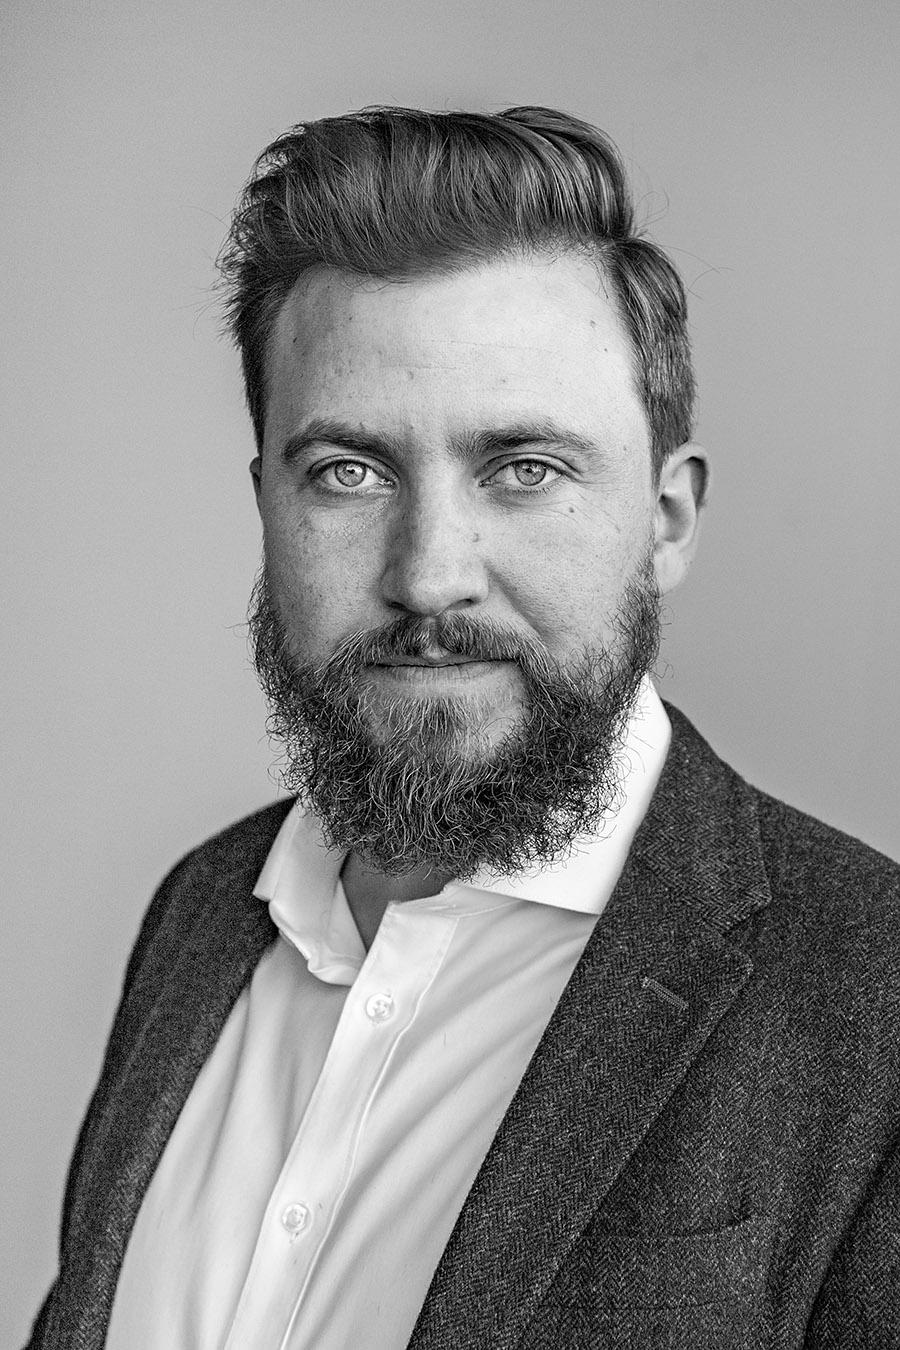 Commswork founder - Beam head of communications - Liam Fitzpatrick .jpg